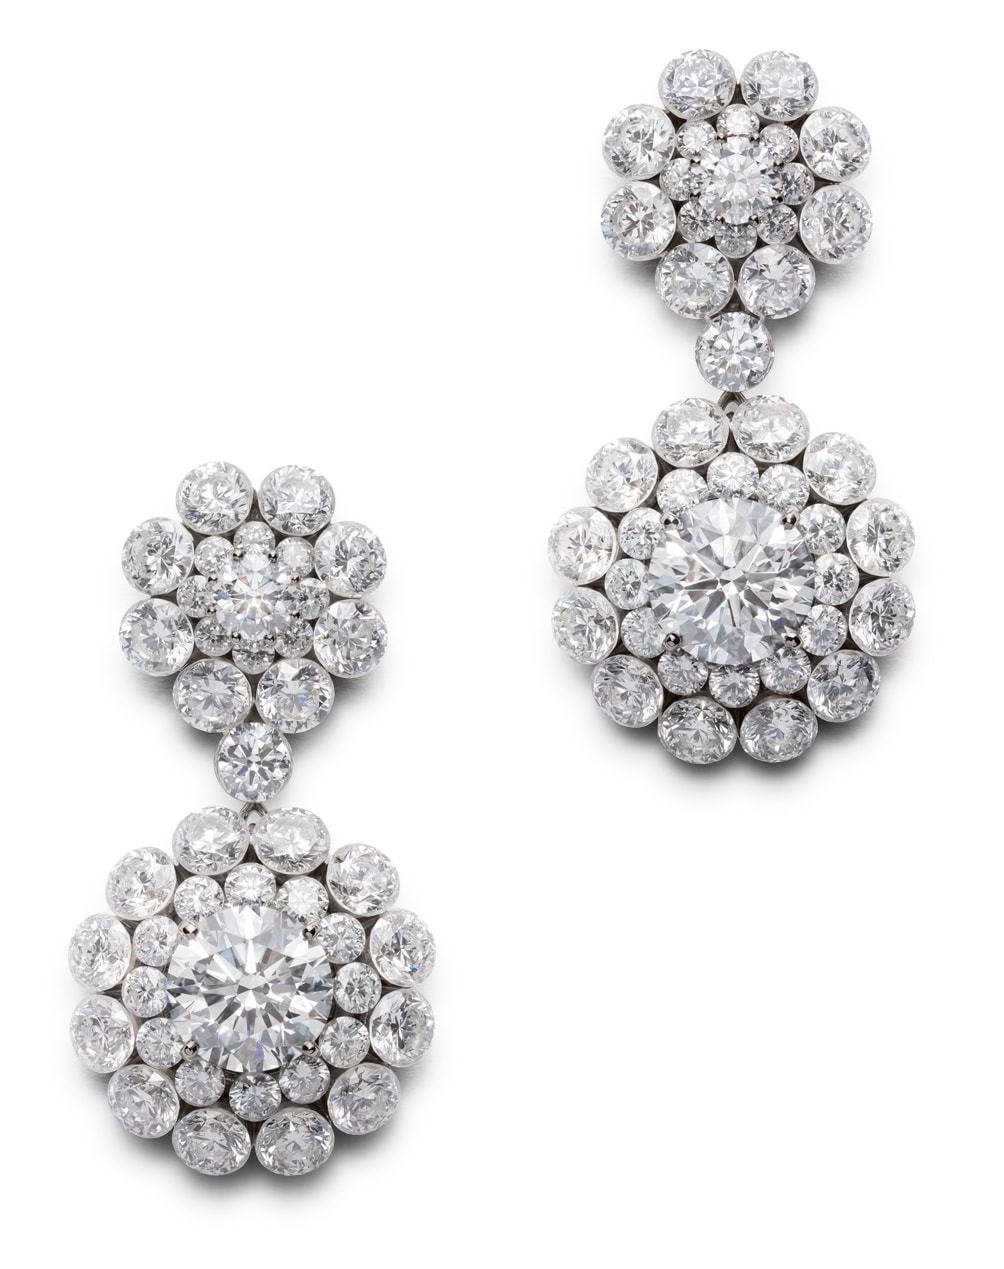 Chopard-Haute-Joaillerie-Magical-Setting-Jewellery-10-Earrings-min